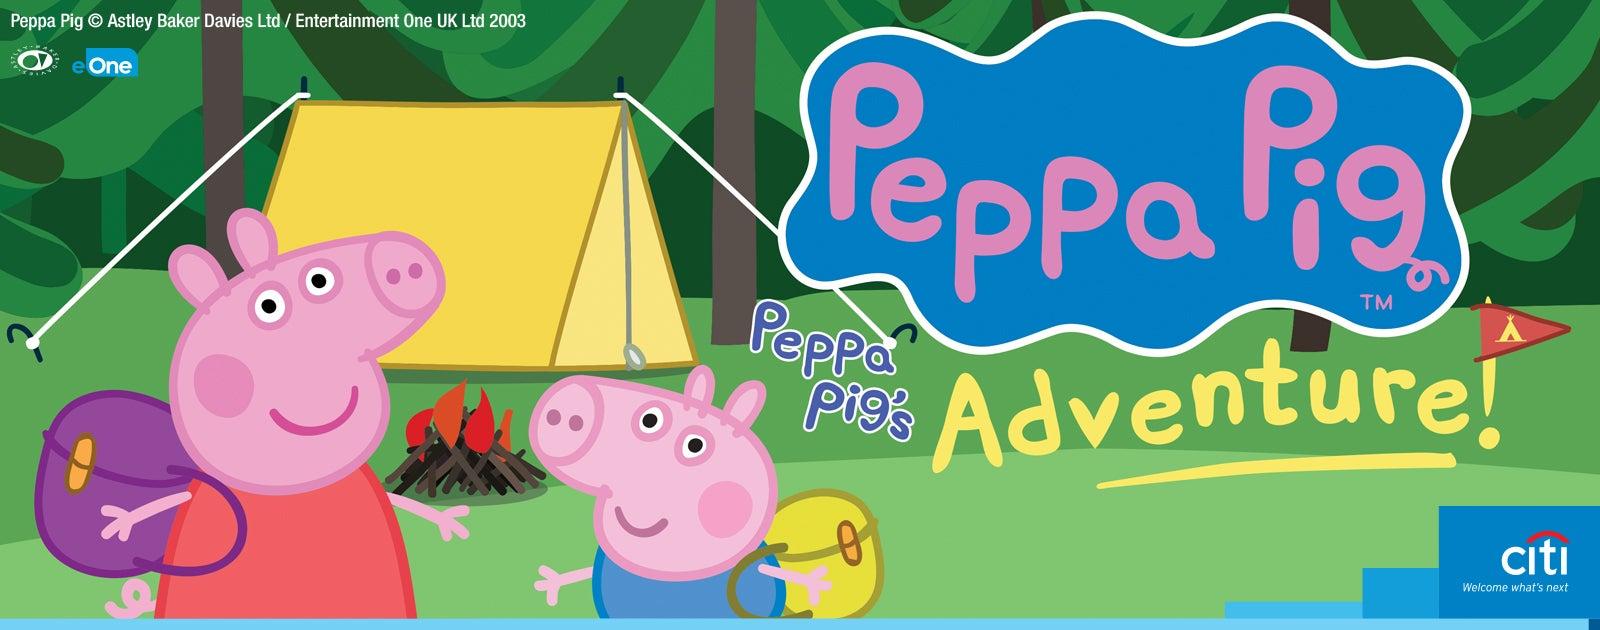 Peppa Pig Live! Peppa Pig's Adventure!